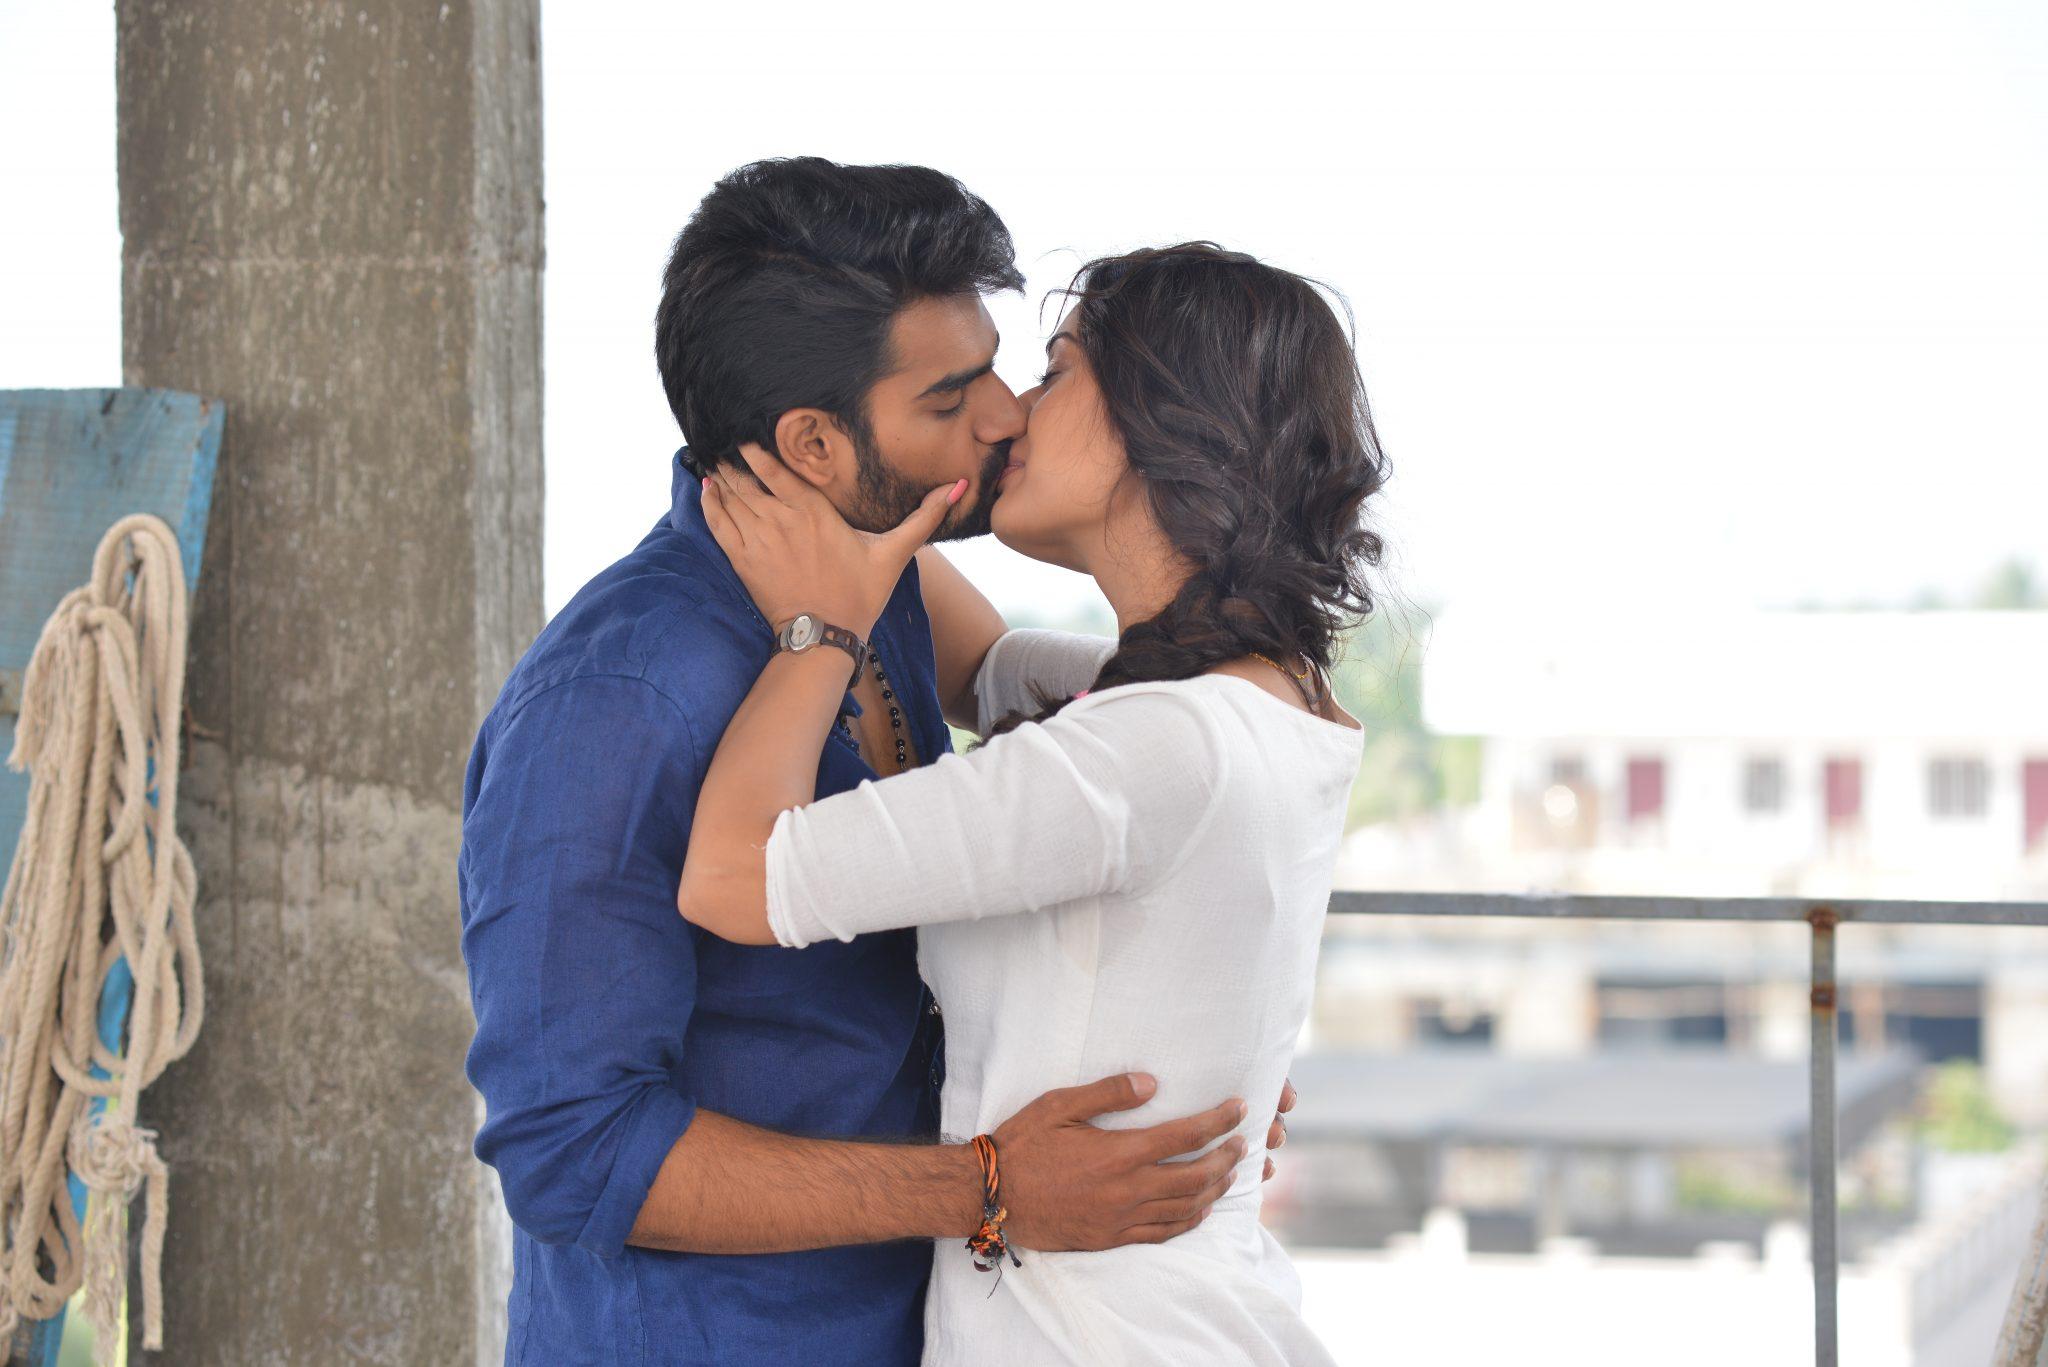 rx100 movie actress payal rajput and karthikeya liplock stills southcolors 13